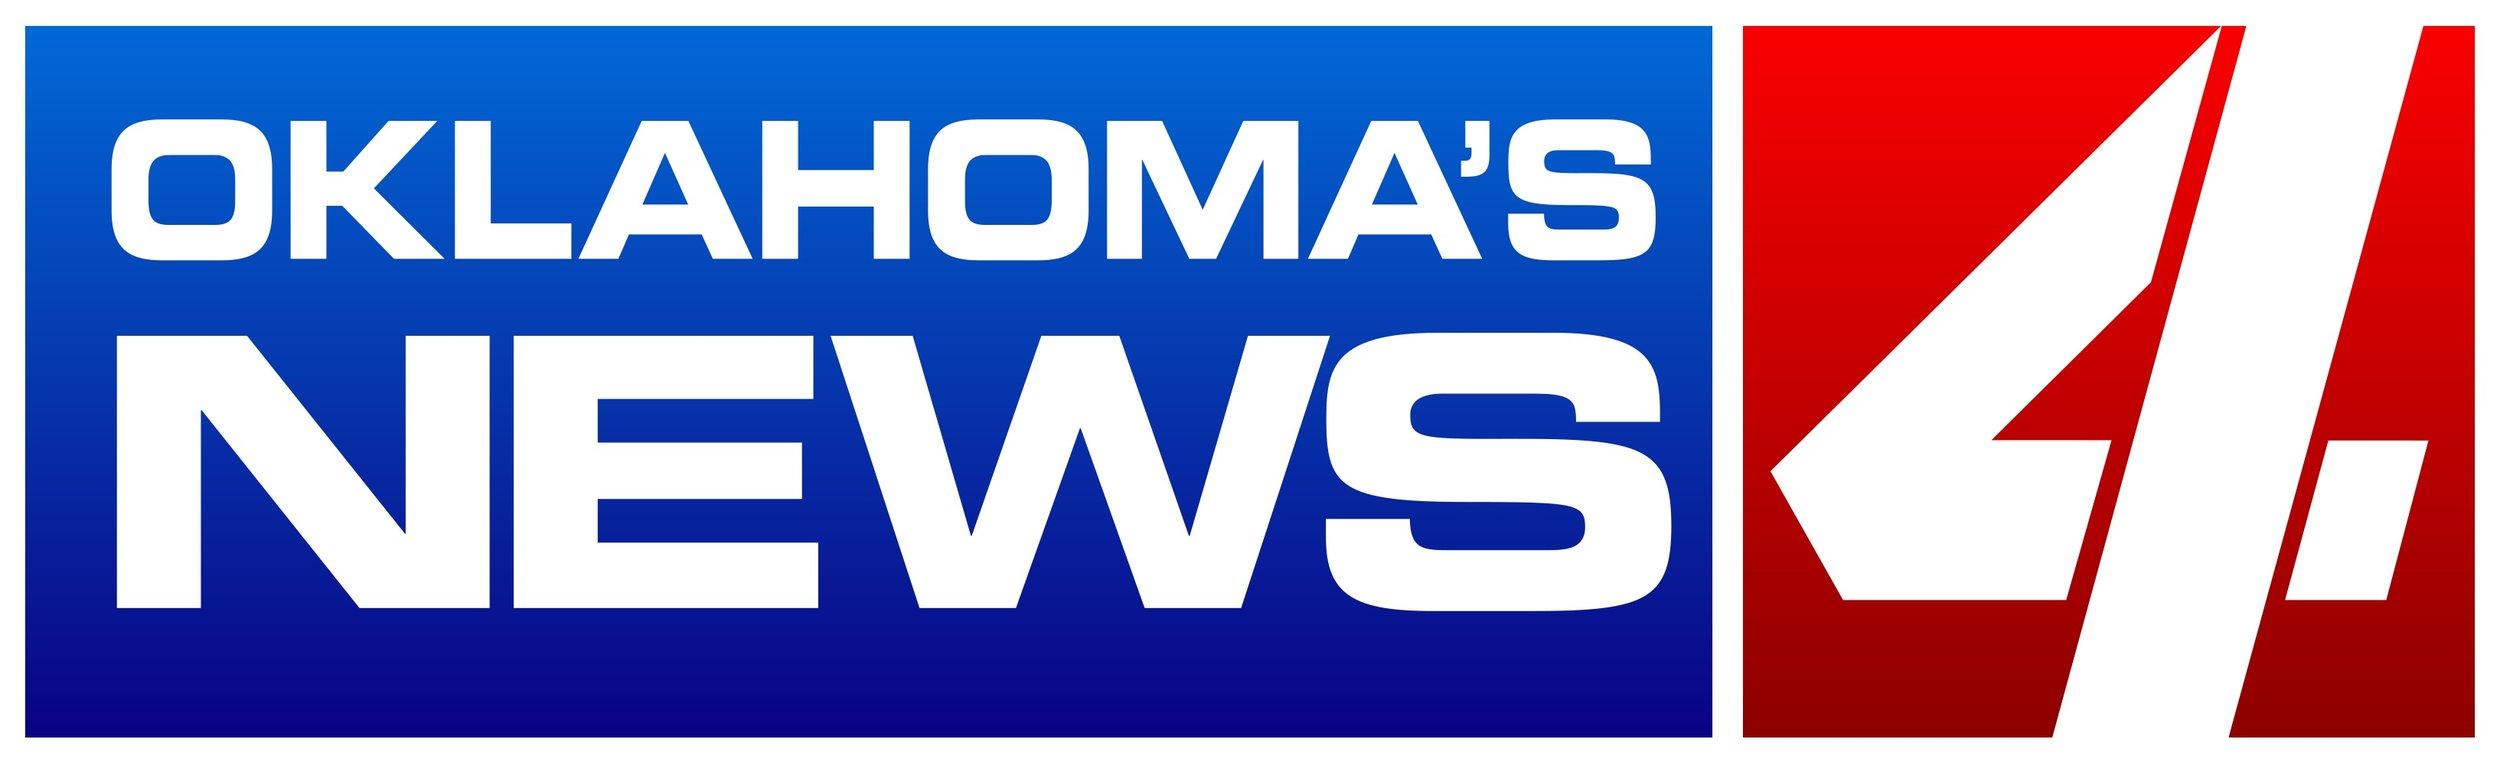 OKs-NEWS-4-Logo-RGB-12.17.jpg